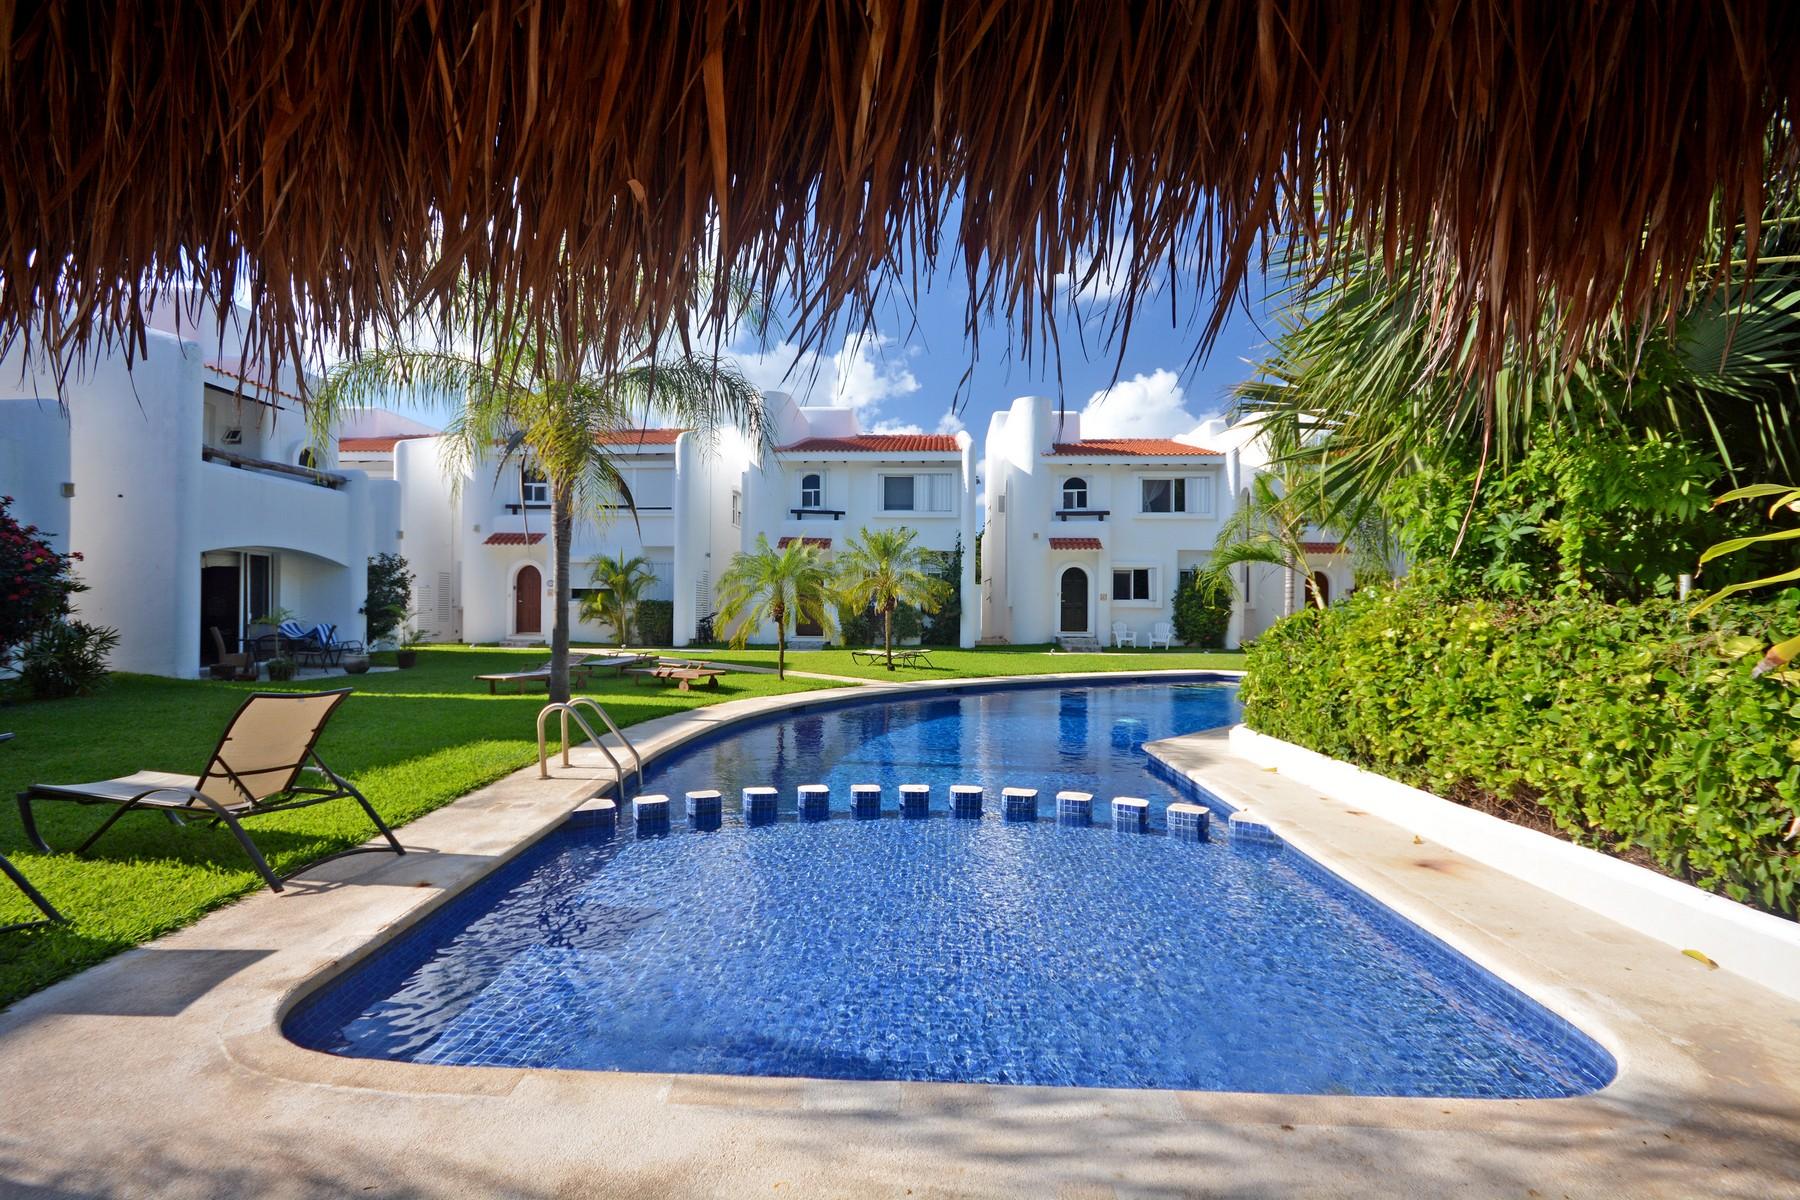 Proprietà in vendita Playa Del Carmen